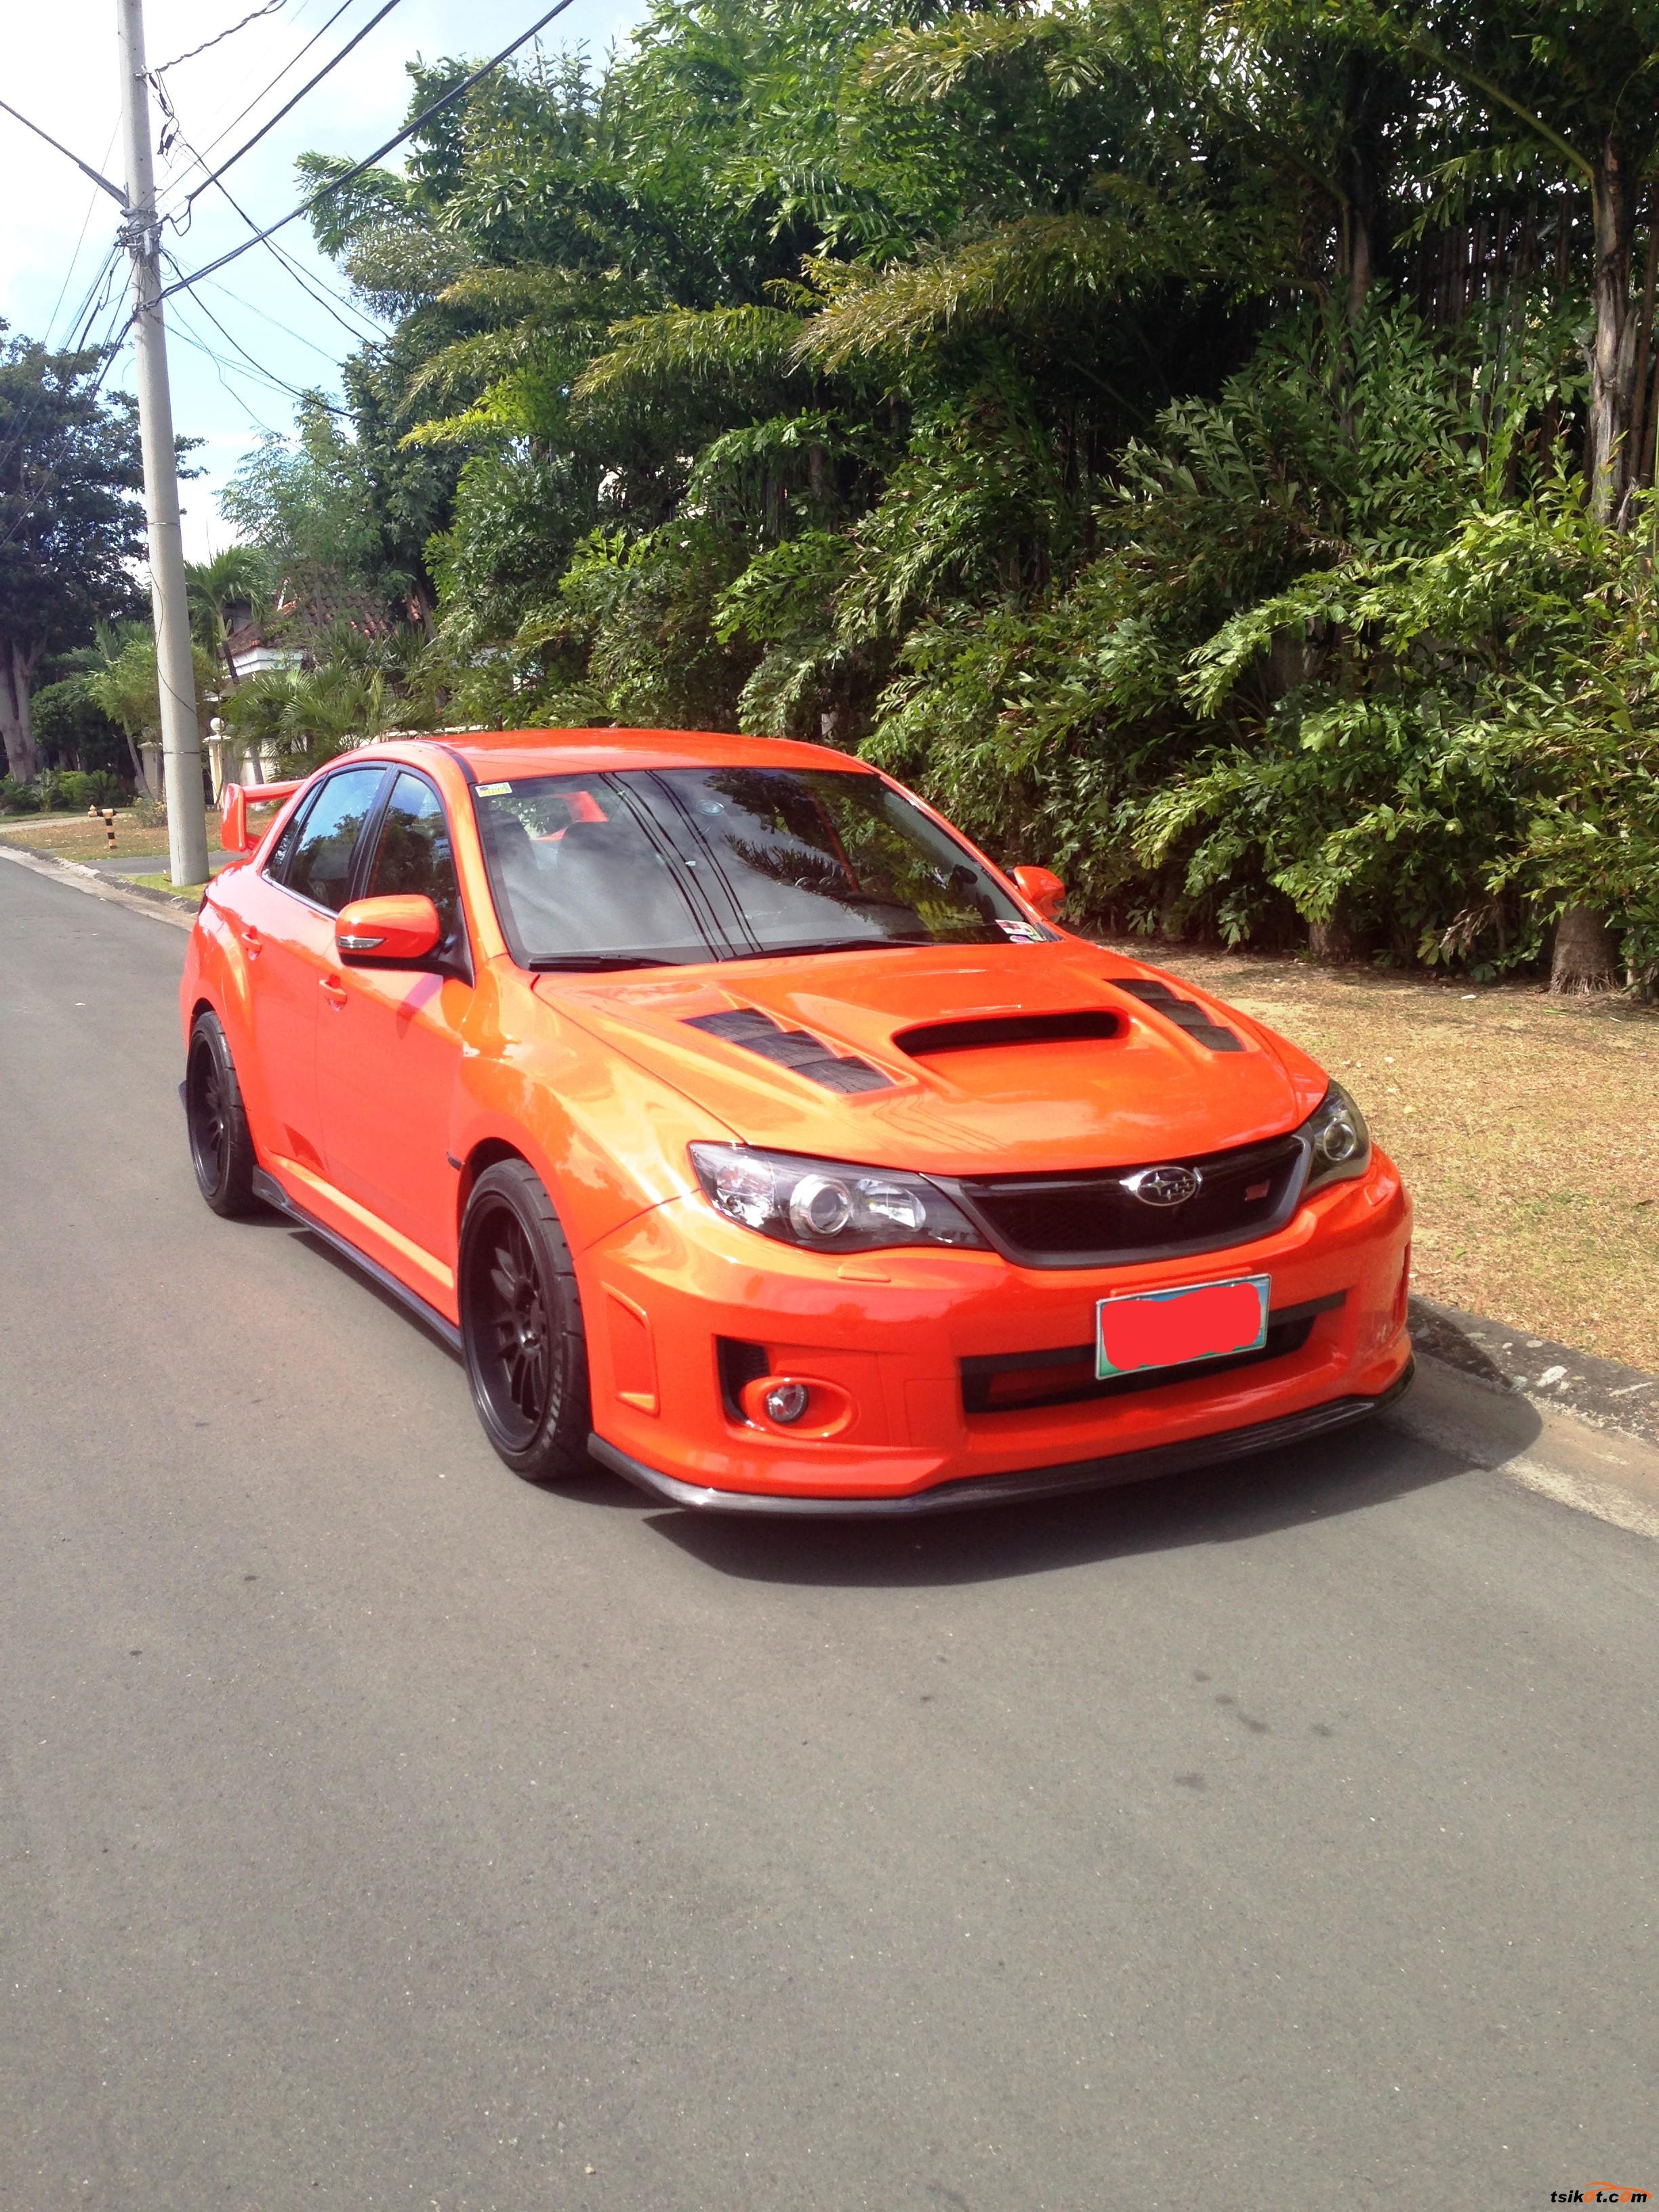 Subaru Impreza Wrx 2011 - 1